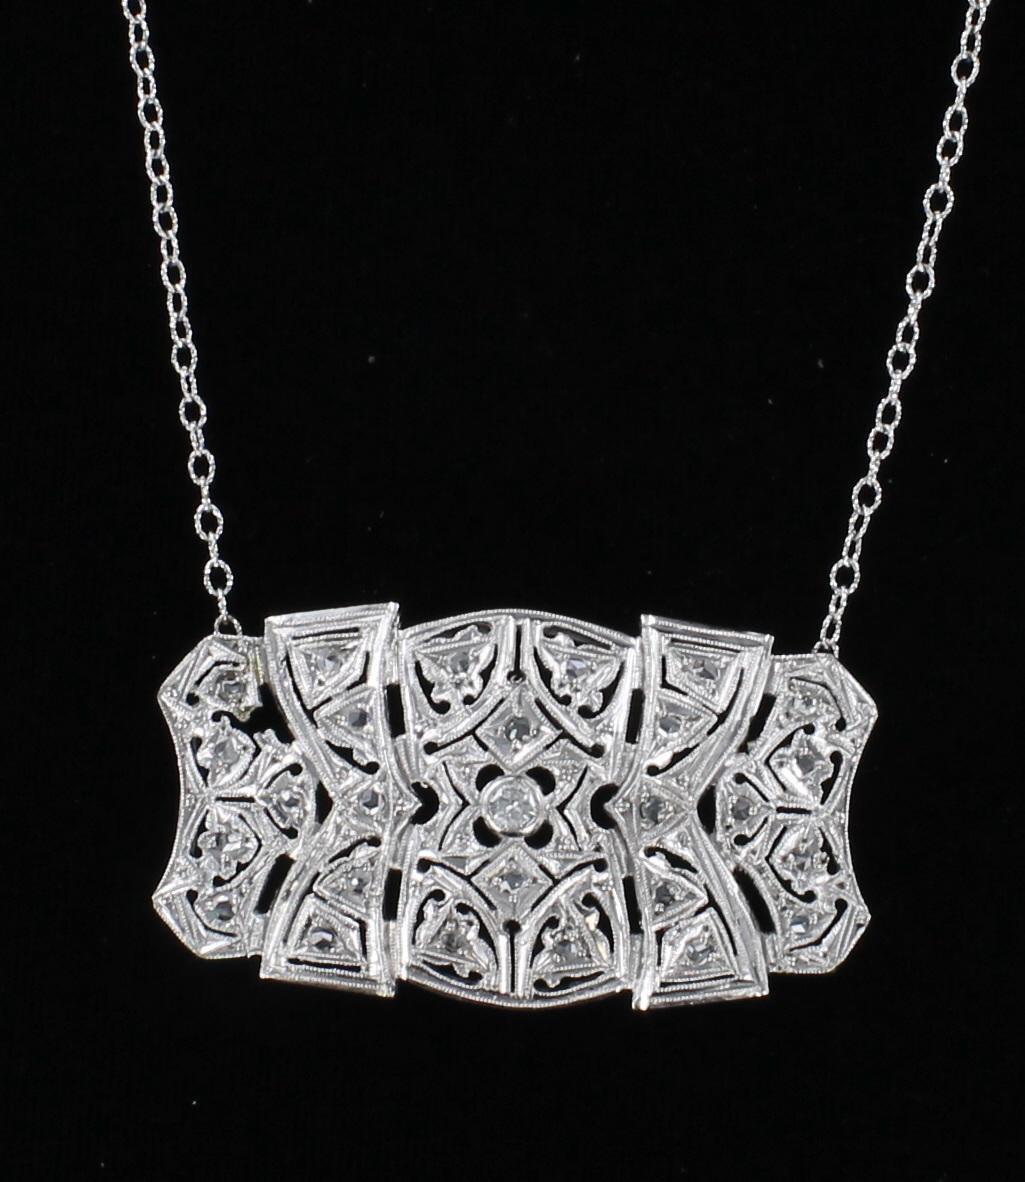 18KT ART DECO DIAMOND NECKLACE